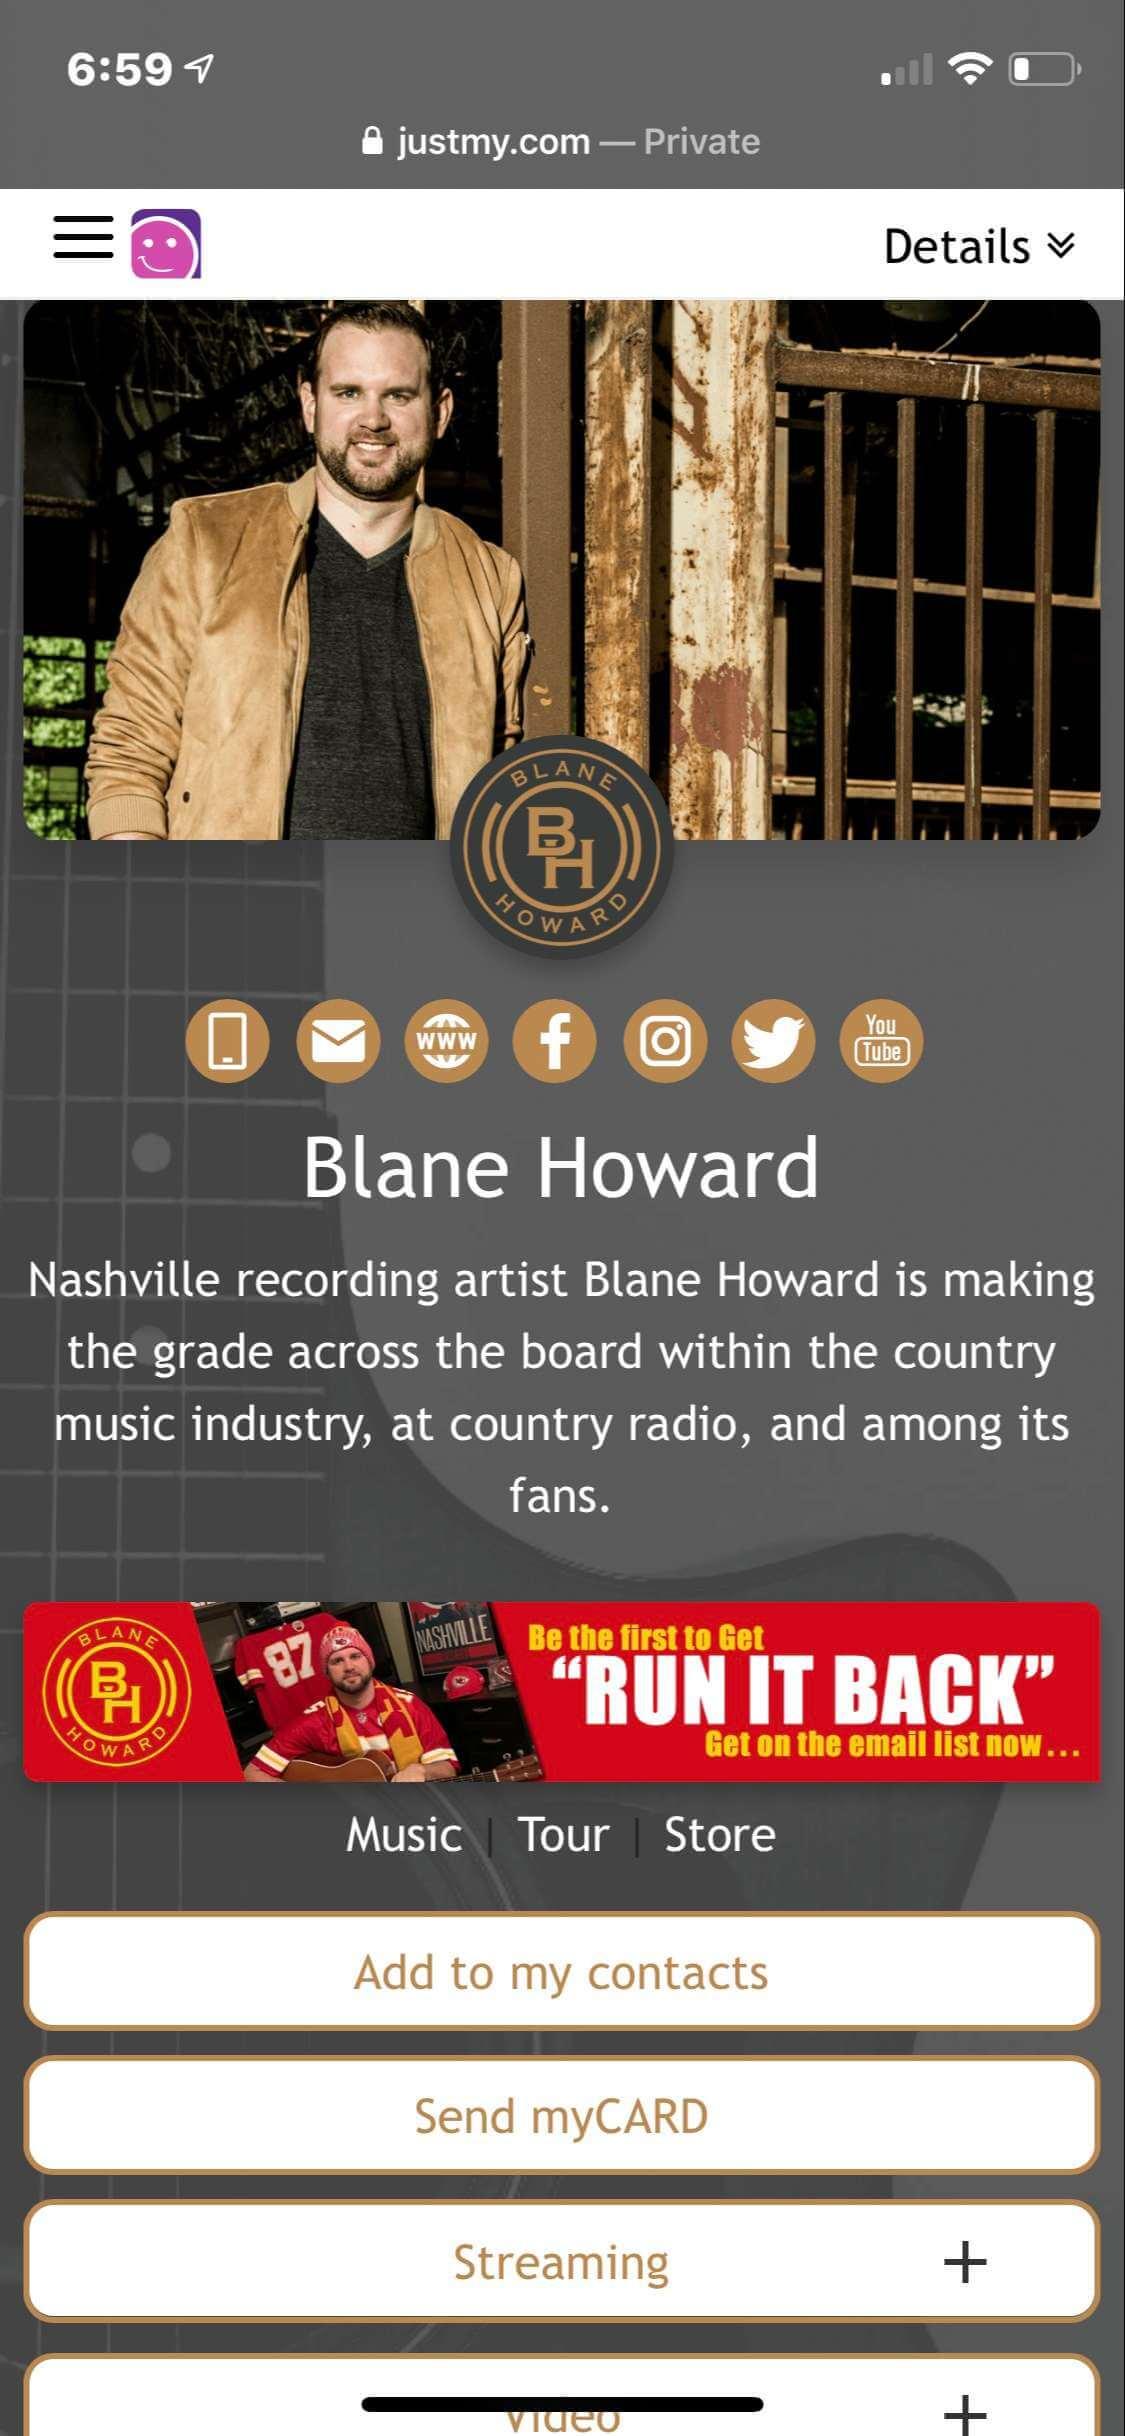 #grabmyCARD  Blane Howard